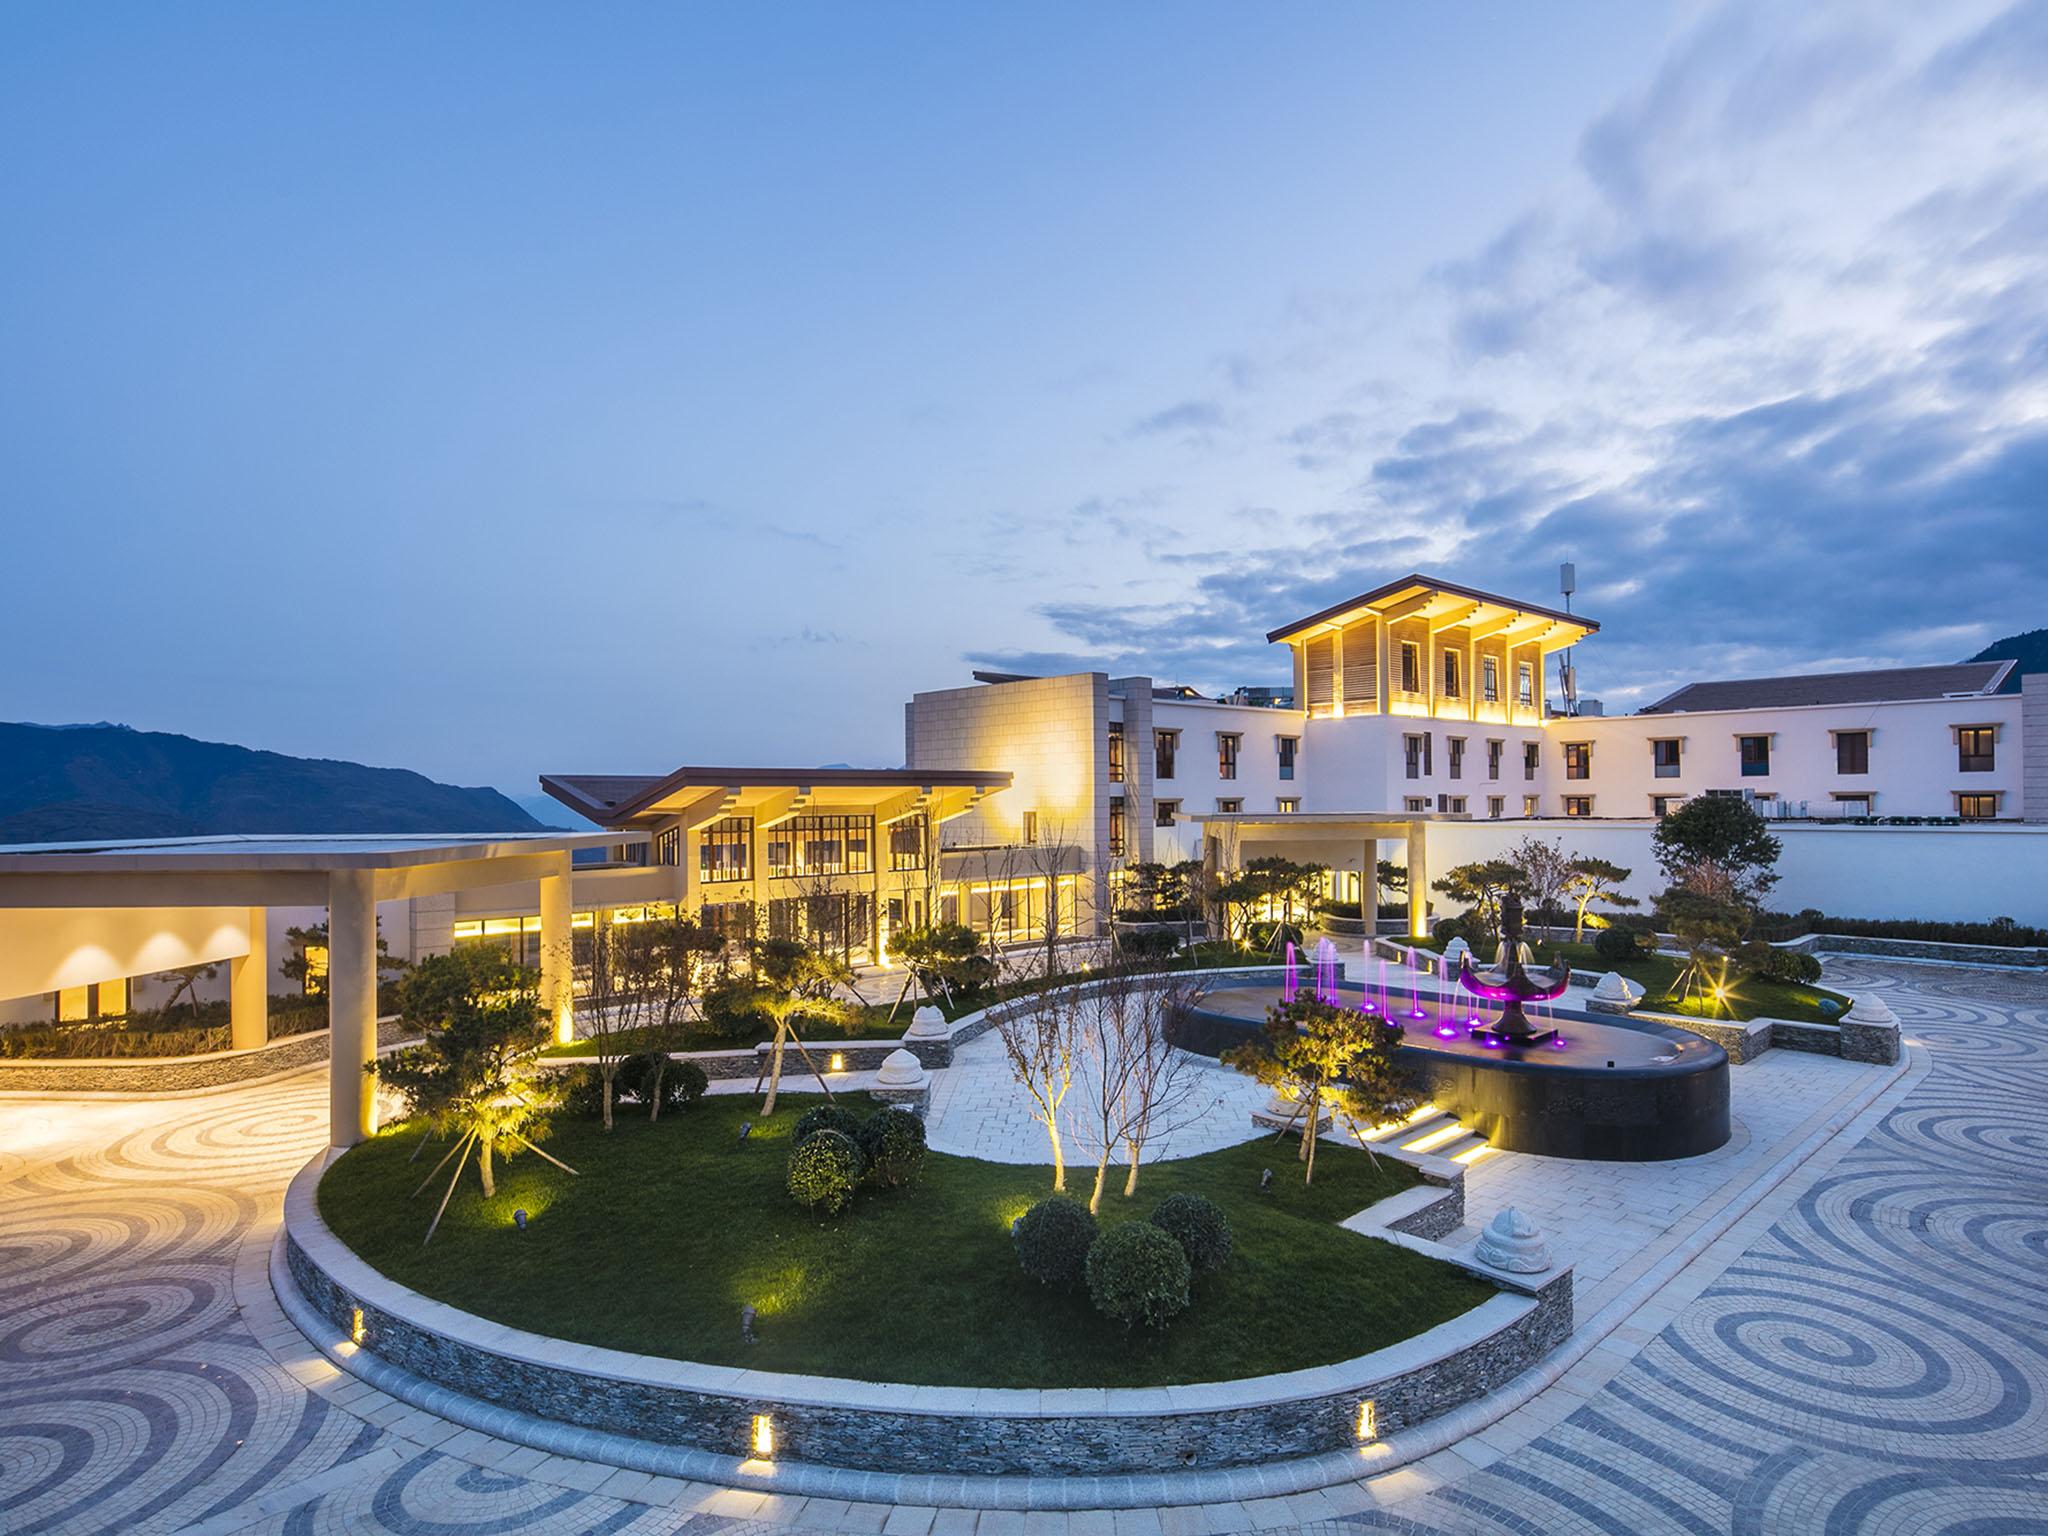 Hotell – Banyan Tree Jiuzhaigou